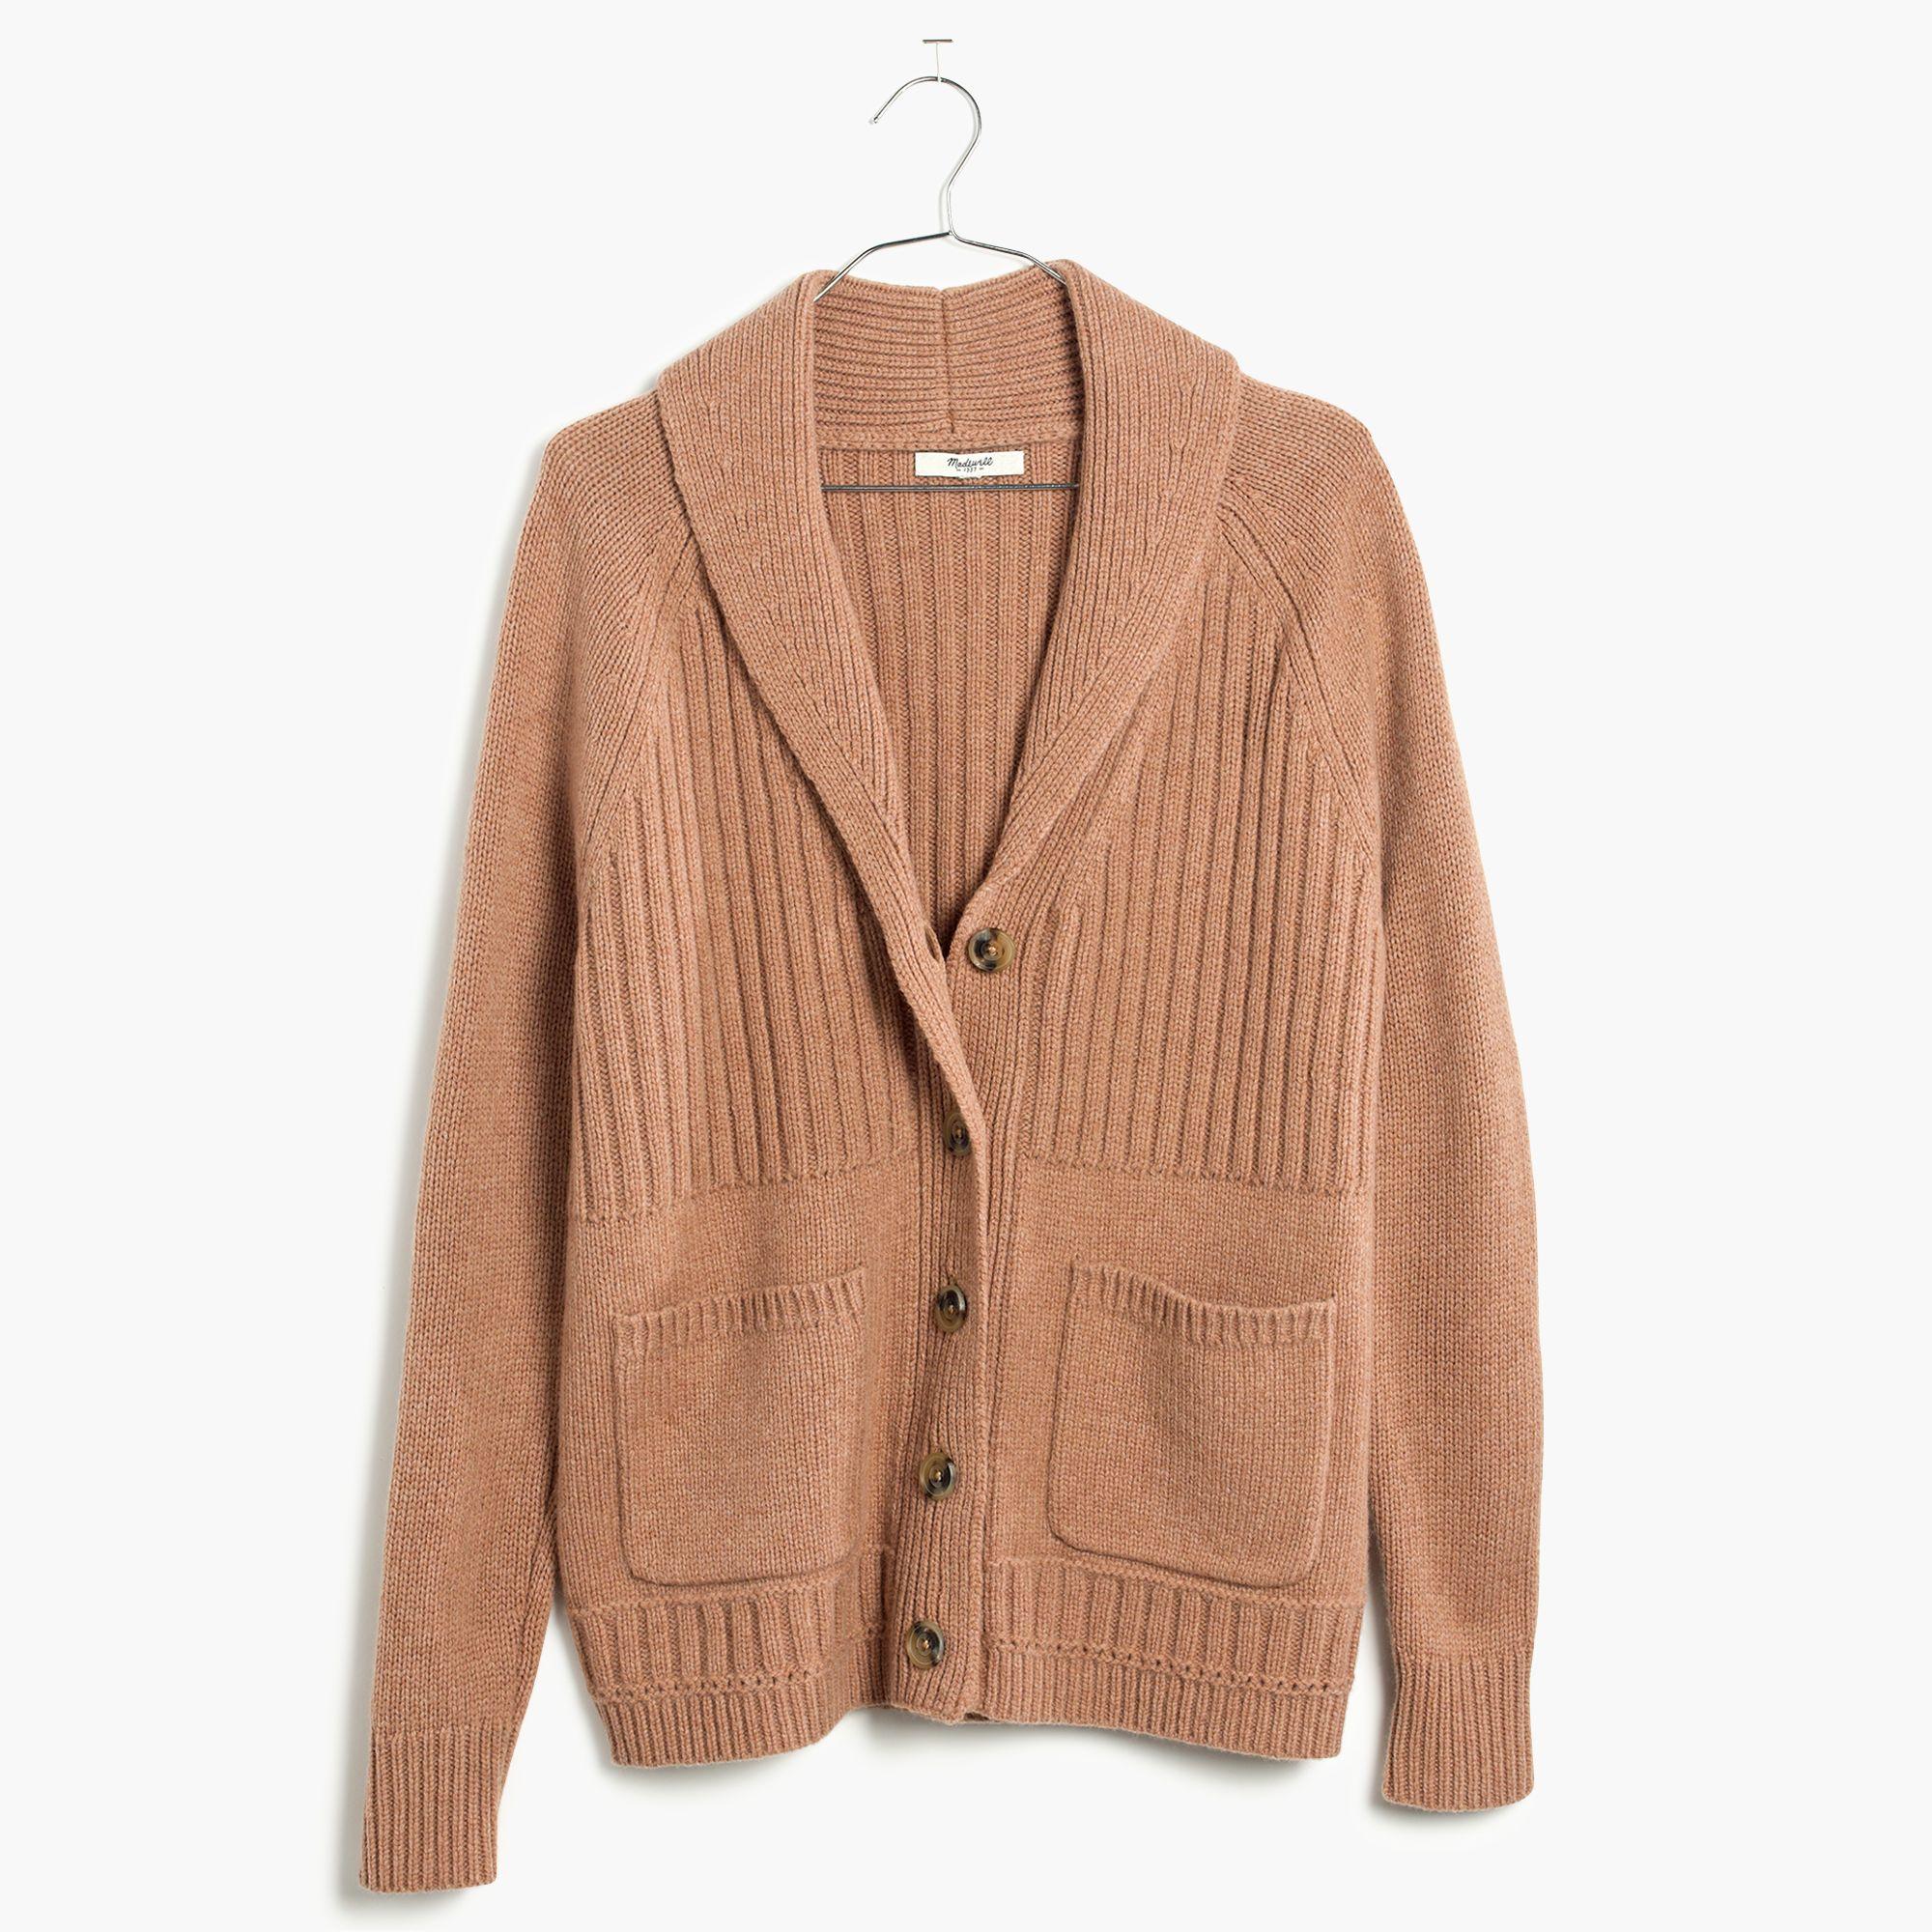 Madewell Shawl-collar Rib Cardigan Sweater in Natural | Lyst